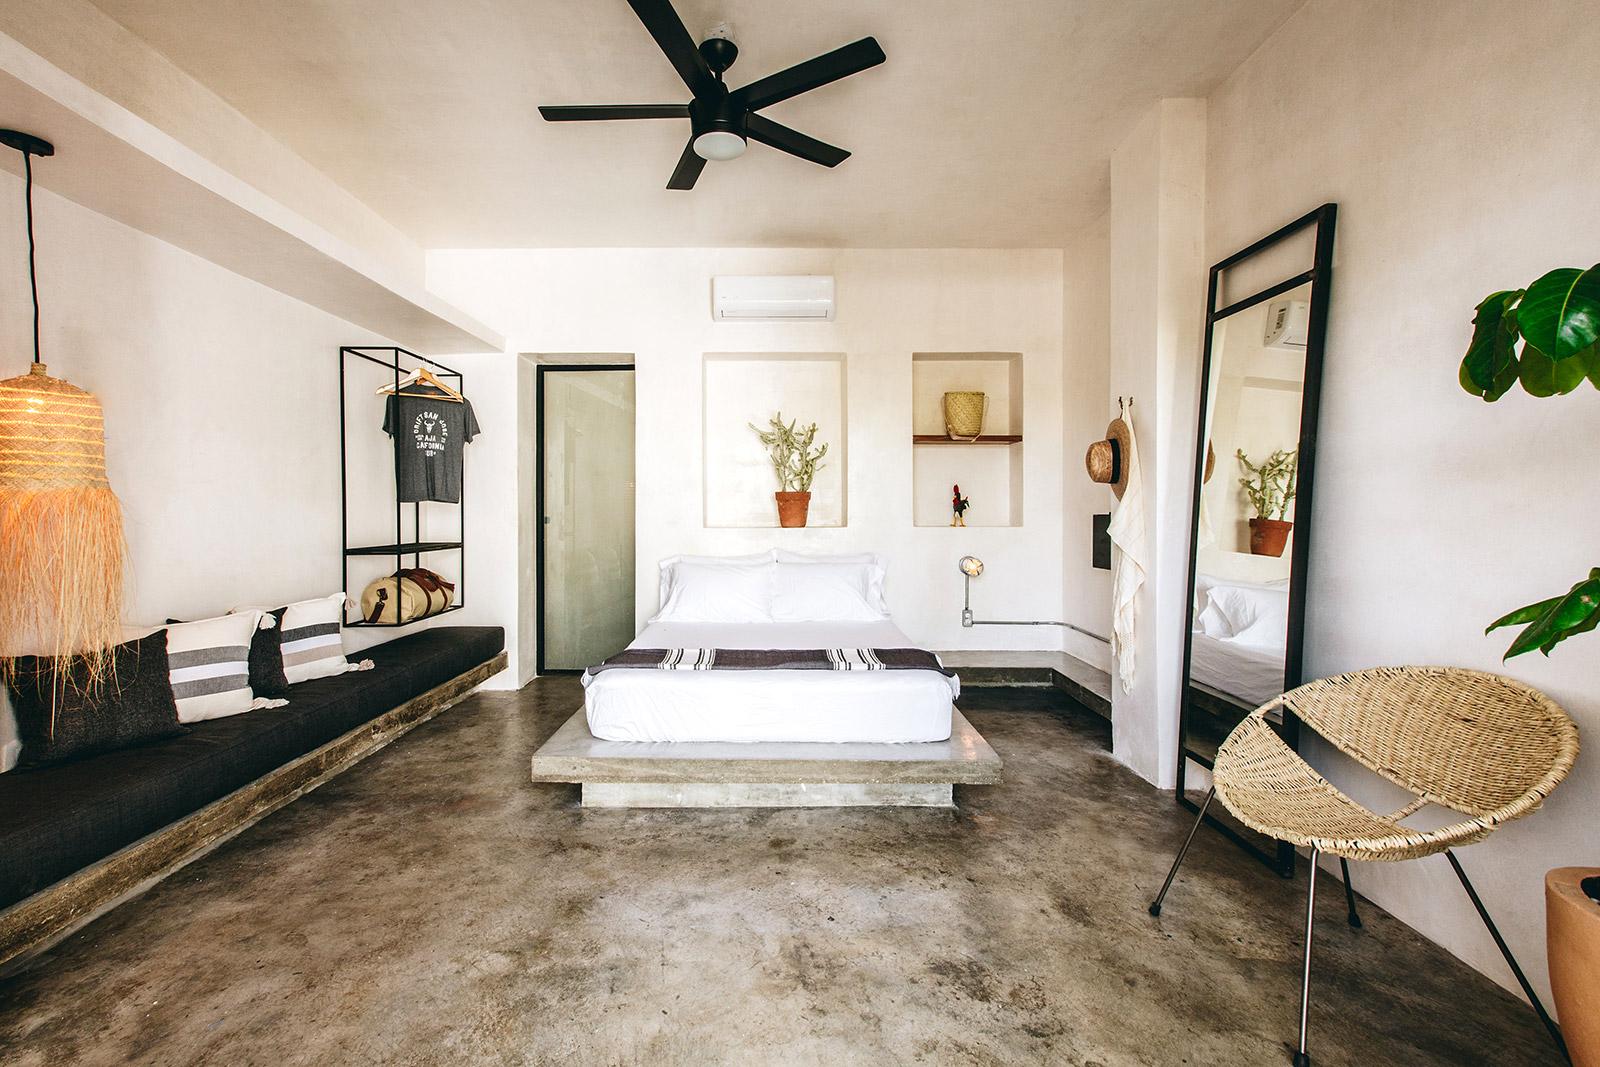 Surfer's paradise hotel Drift San Jose is seeking new owners